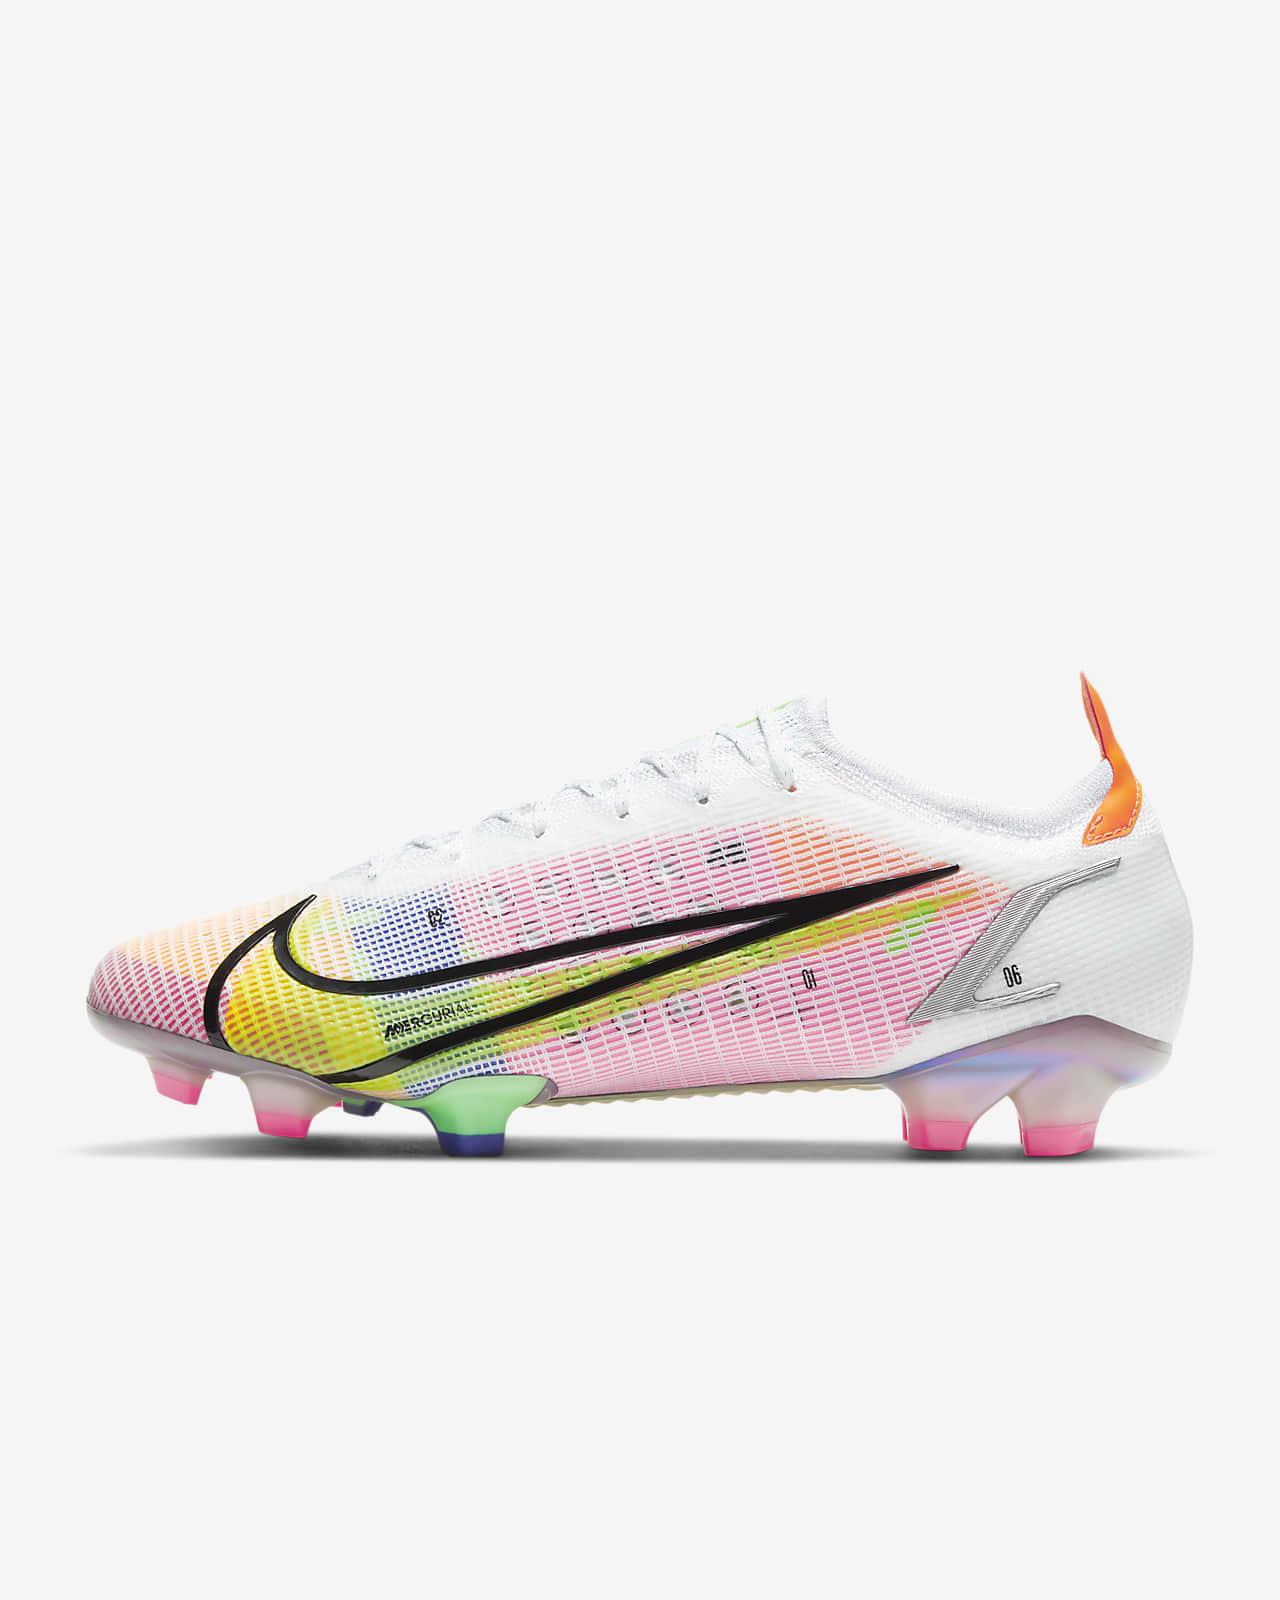 Nike Mercurial Vapor 14 Elite FG Firm-Ground Football Boot